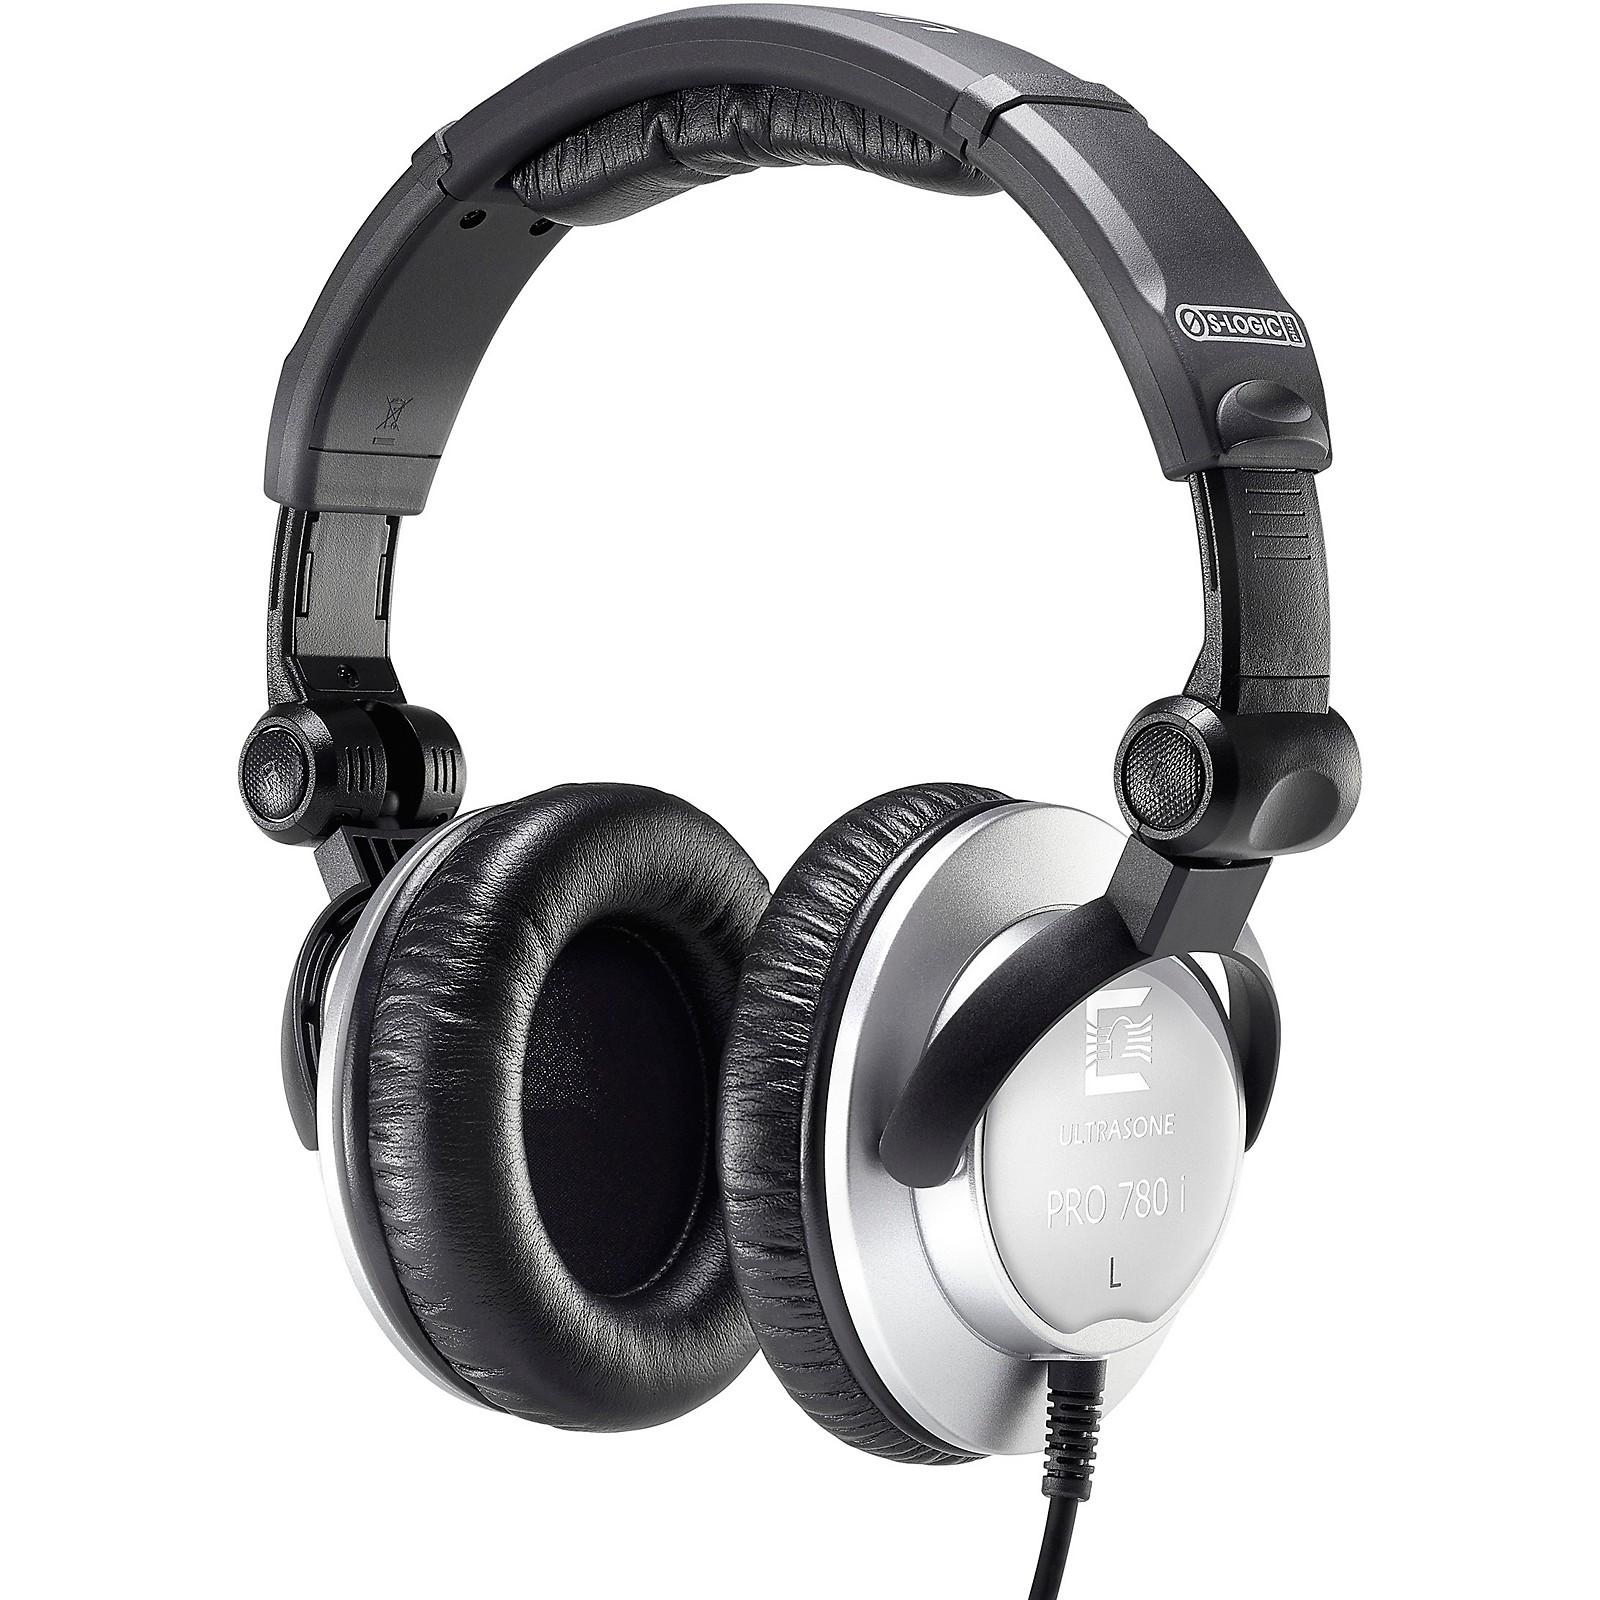 Ultrasone PRO 780i Studio Headphones